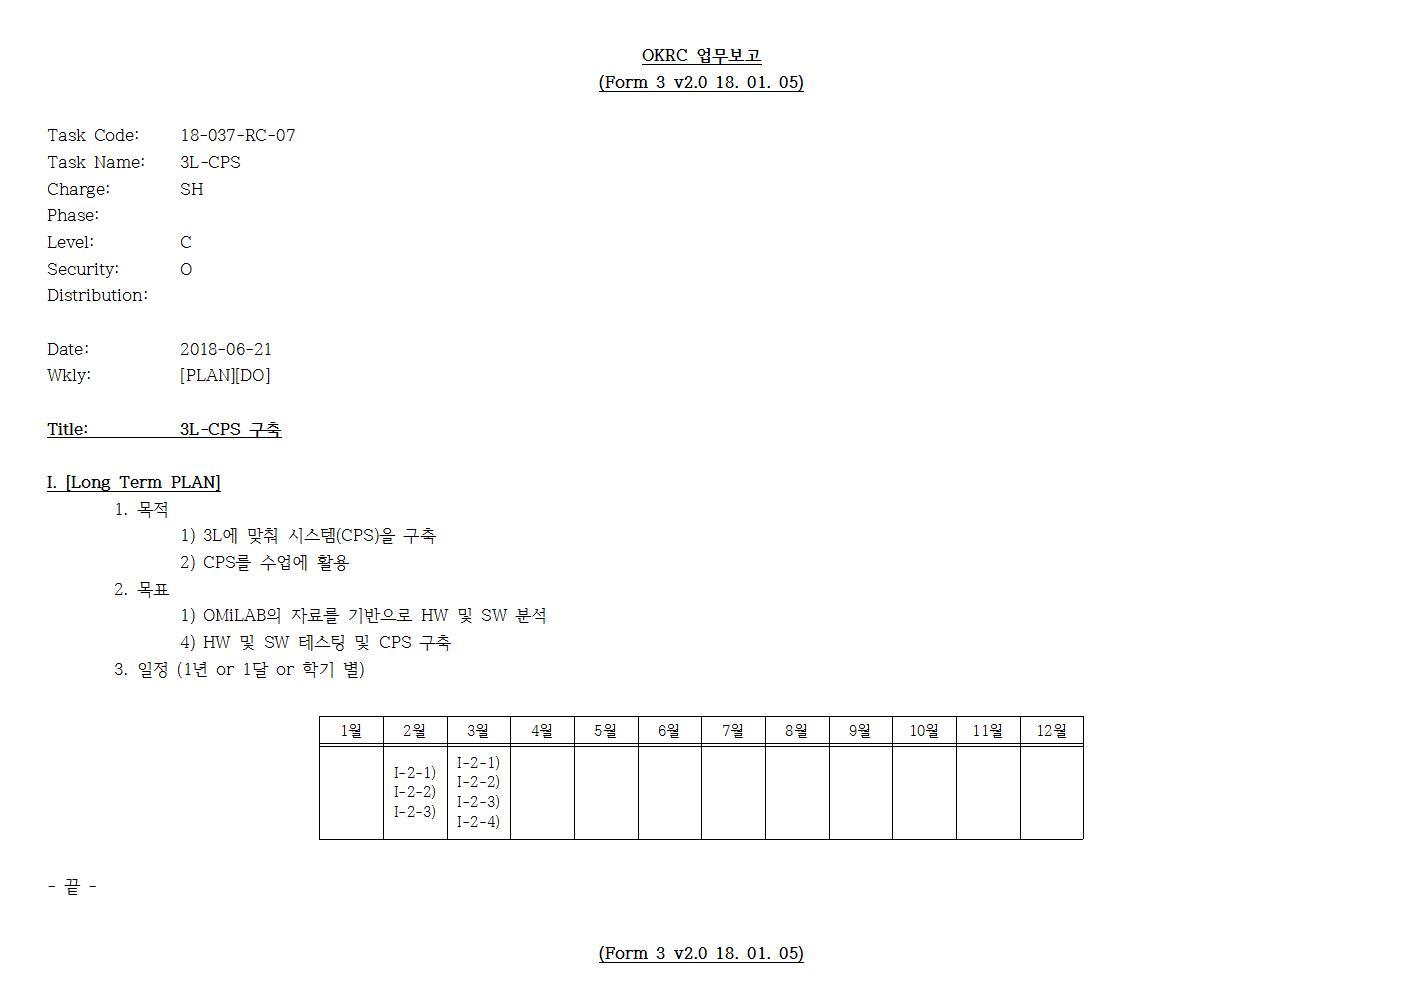 D-[18-037-RC-07]-[3L-CPS]-[2018-06-22][SH]001.jpg